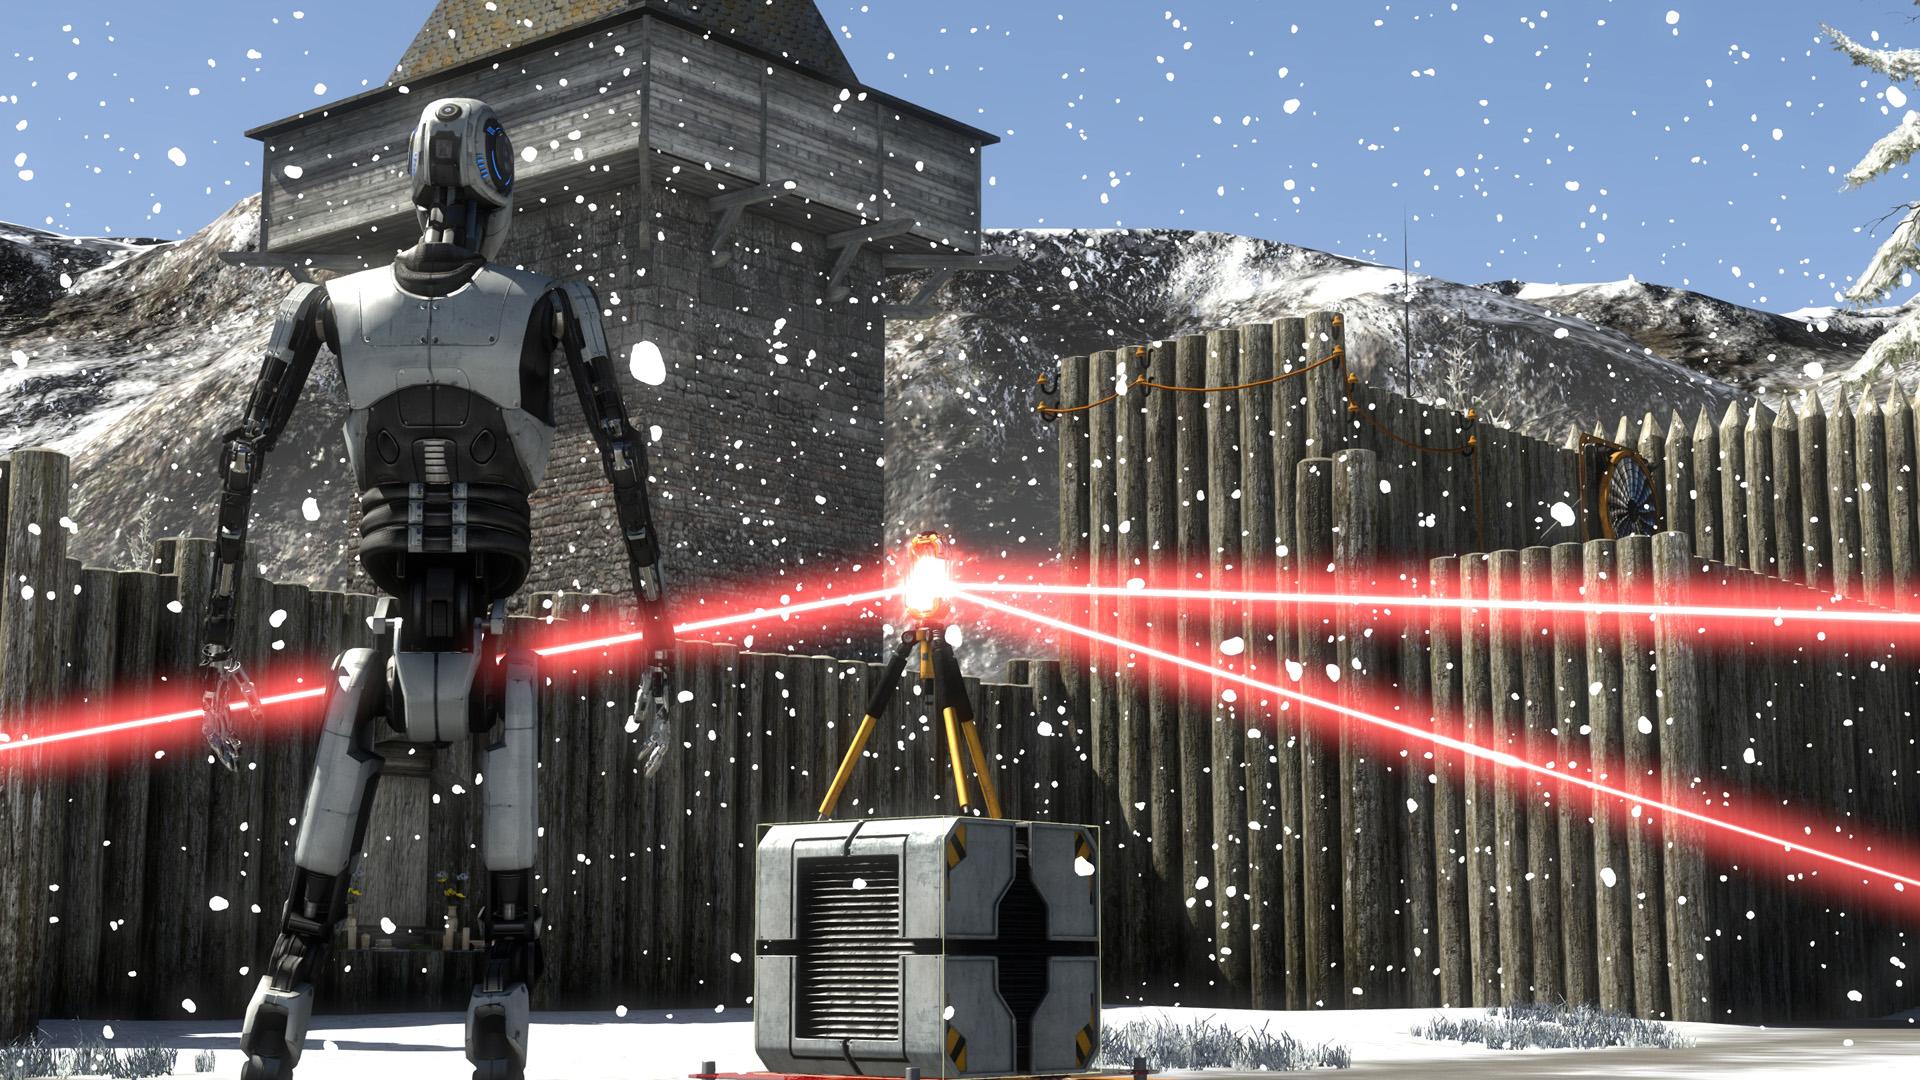 PixelFactory: The Talos Principle monde C4